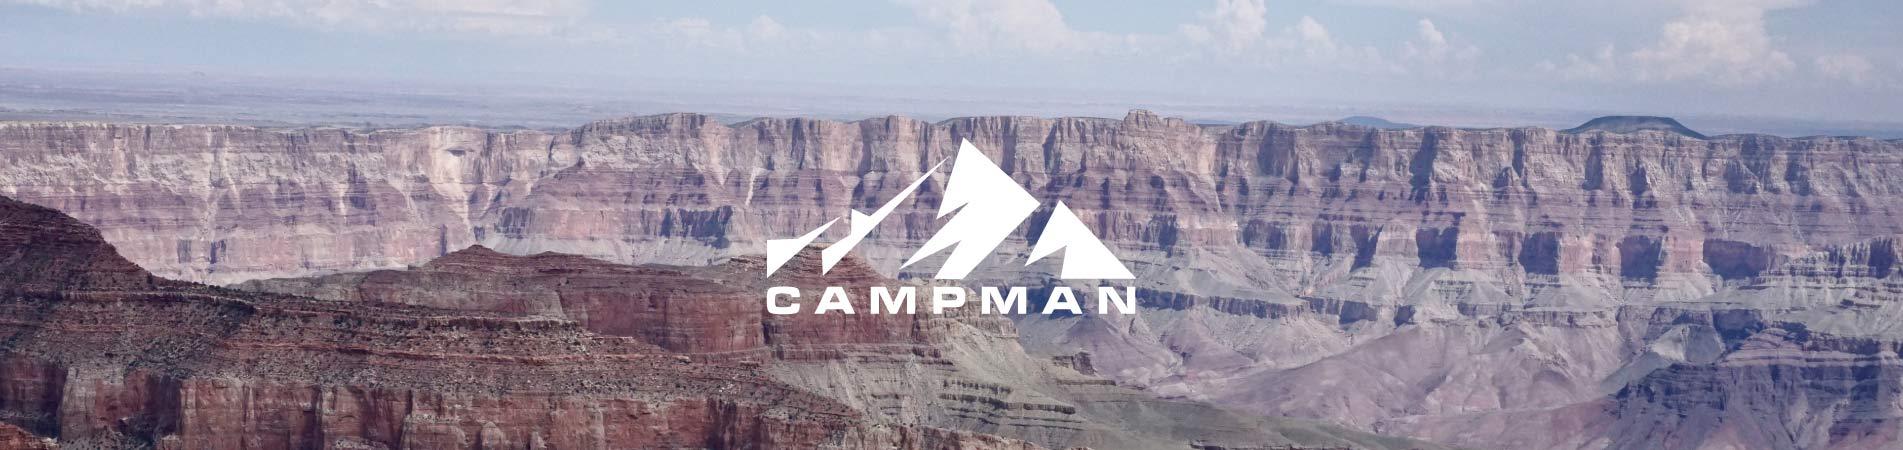 campman-brand-banner-v1r0.jpg